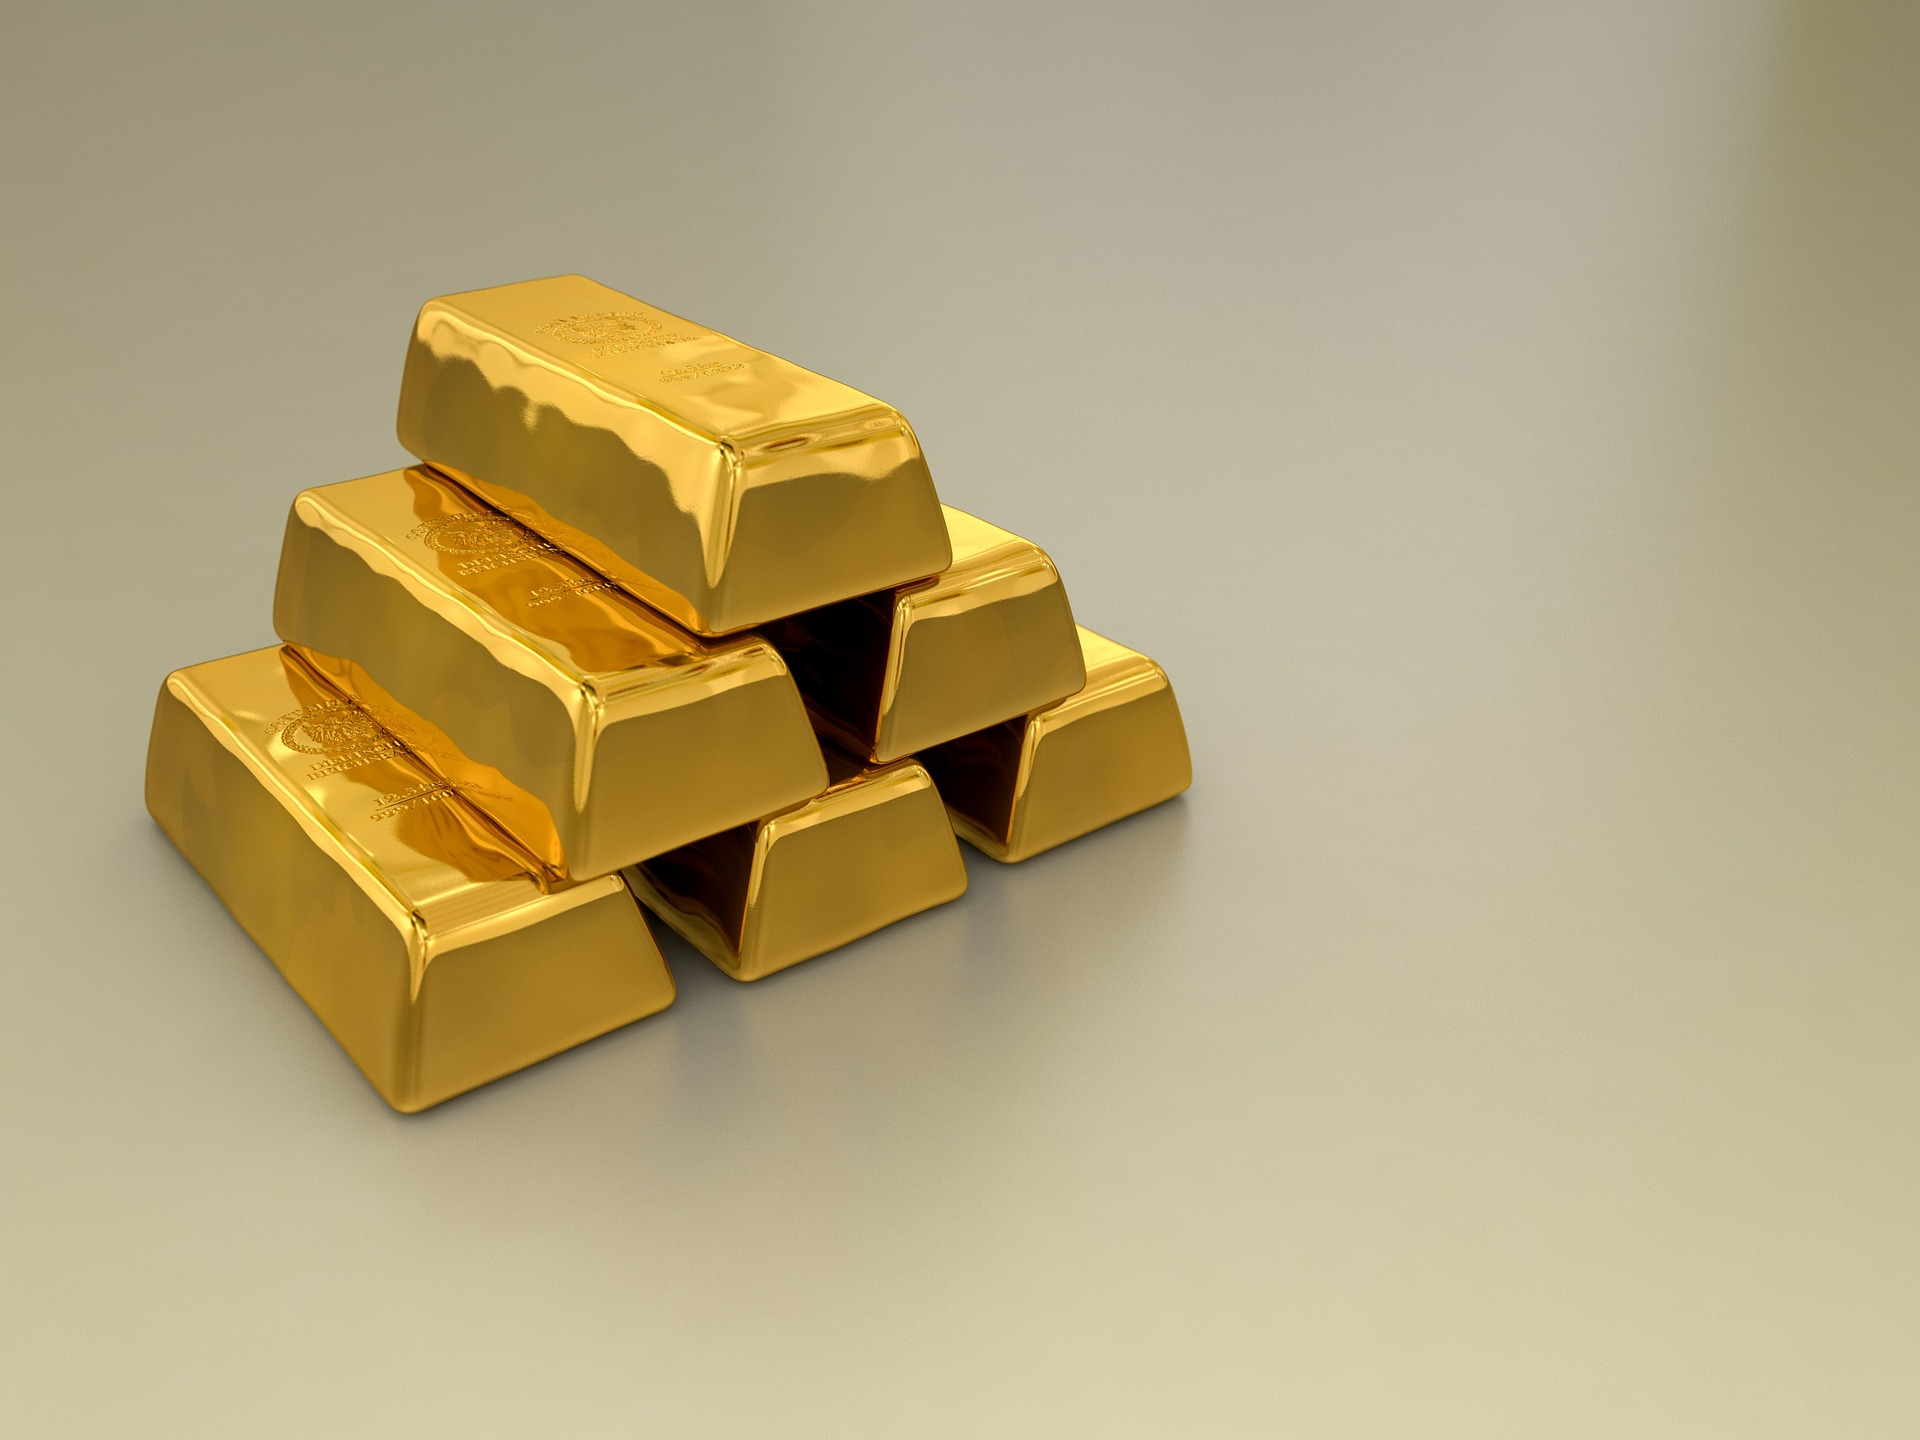 best gold etf